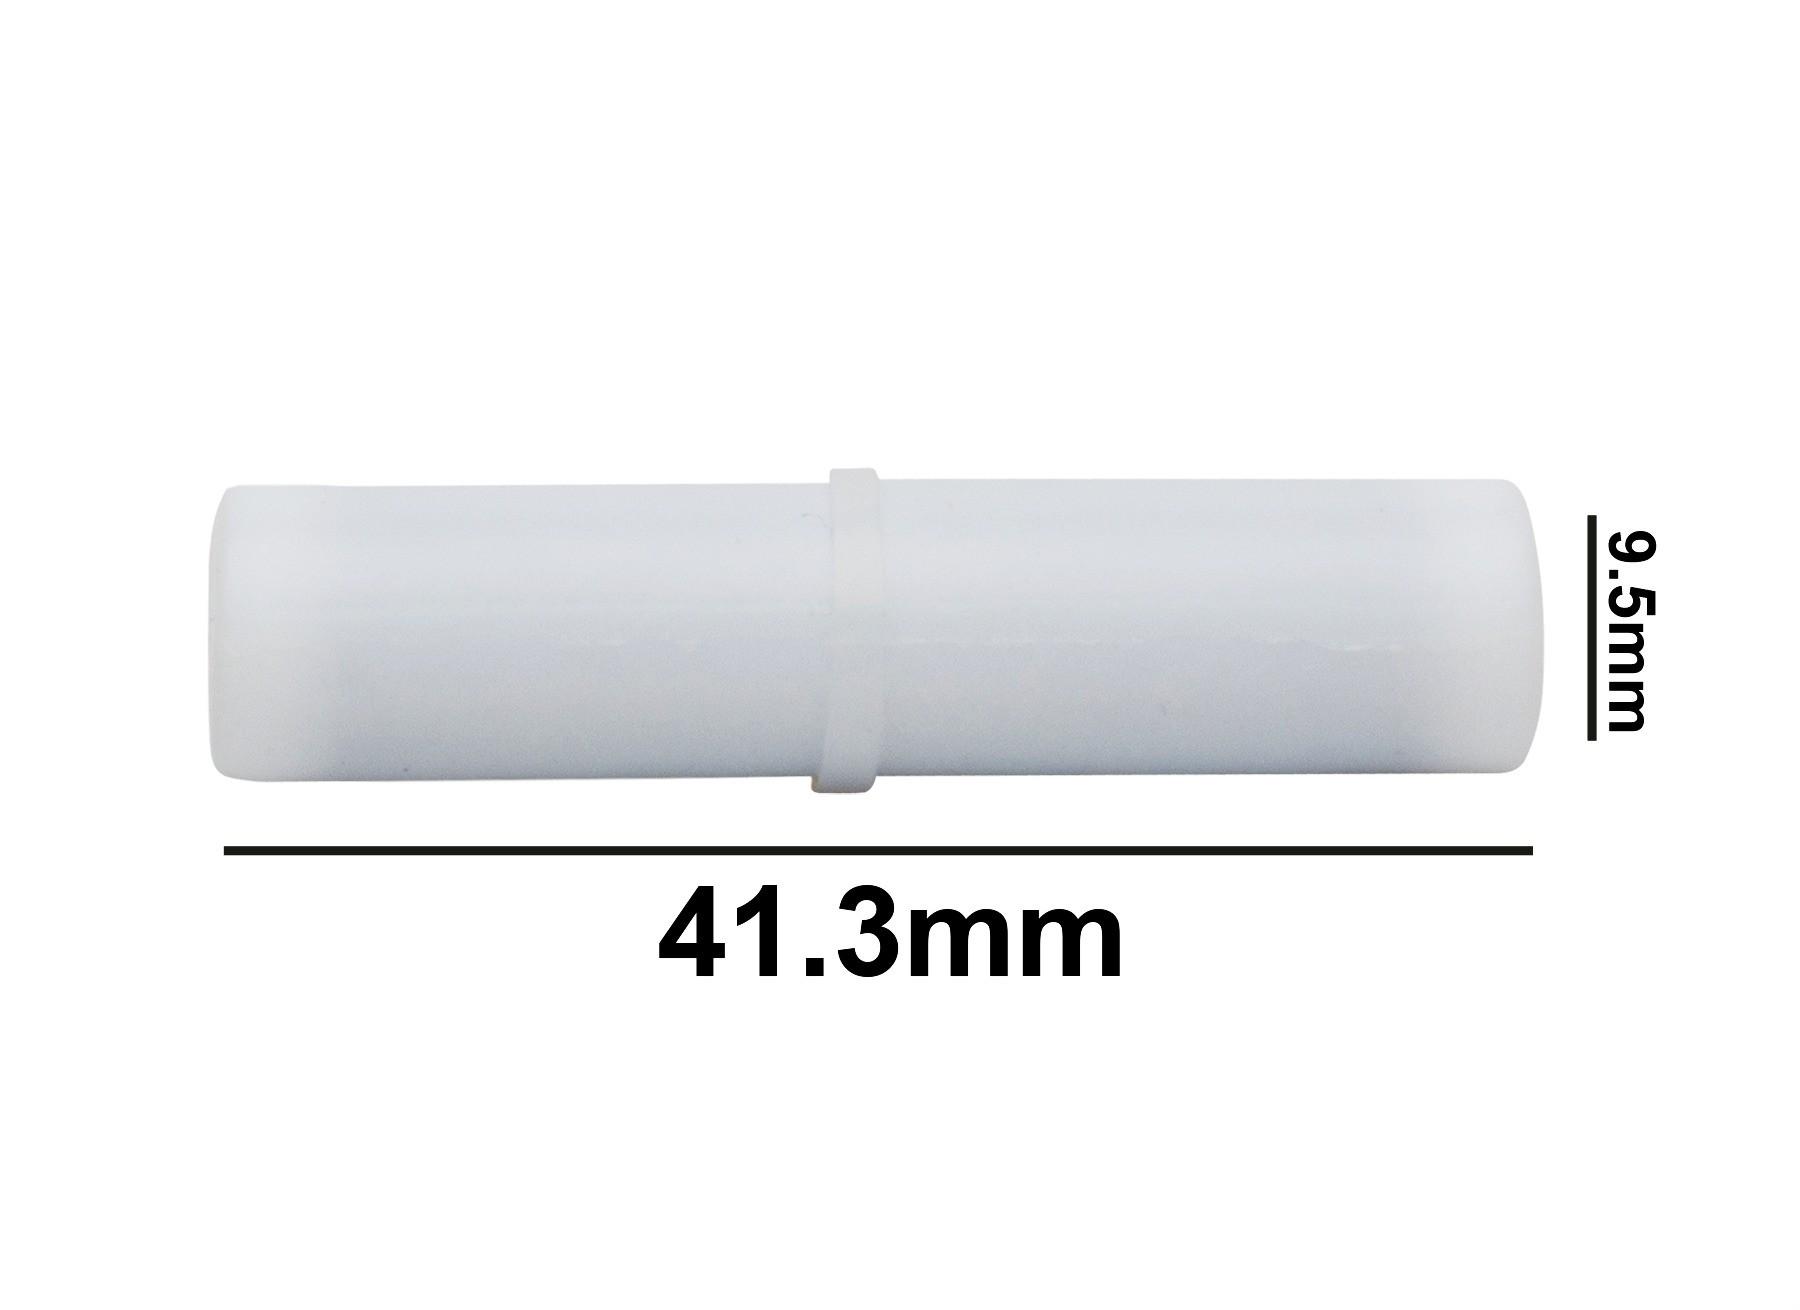 SP Bel-Art Spinbar Teflon Cylindrical Magnetic Stirring Bar; 41.3 x 9.5mm, White